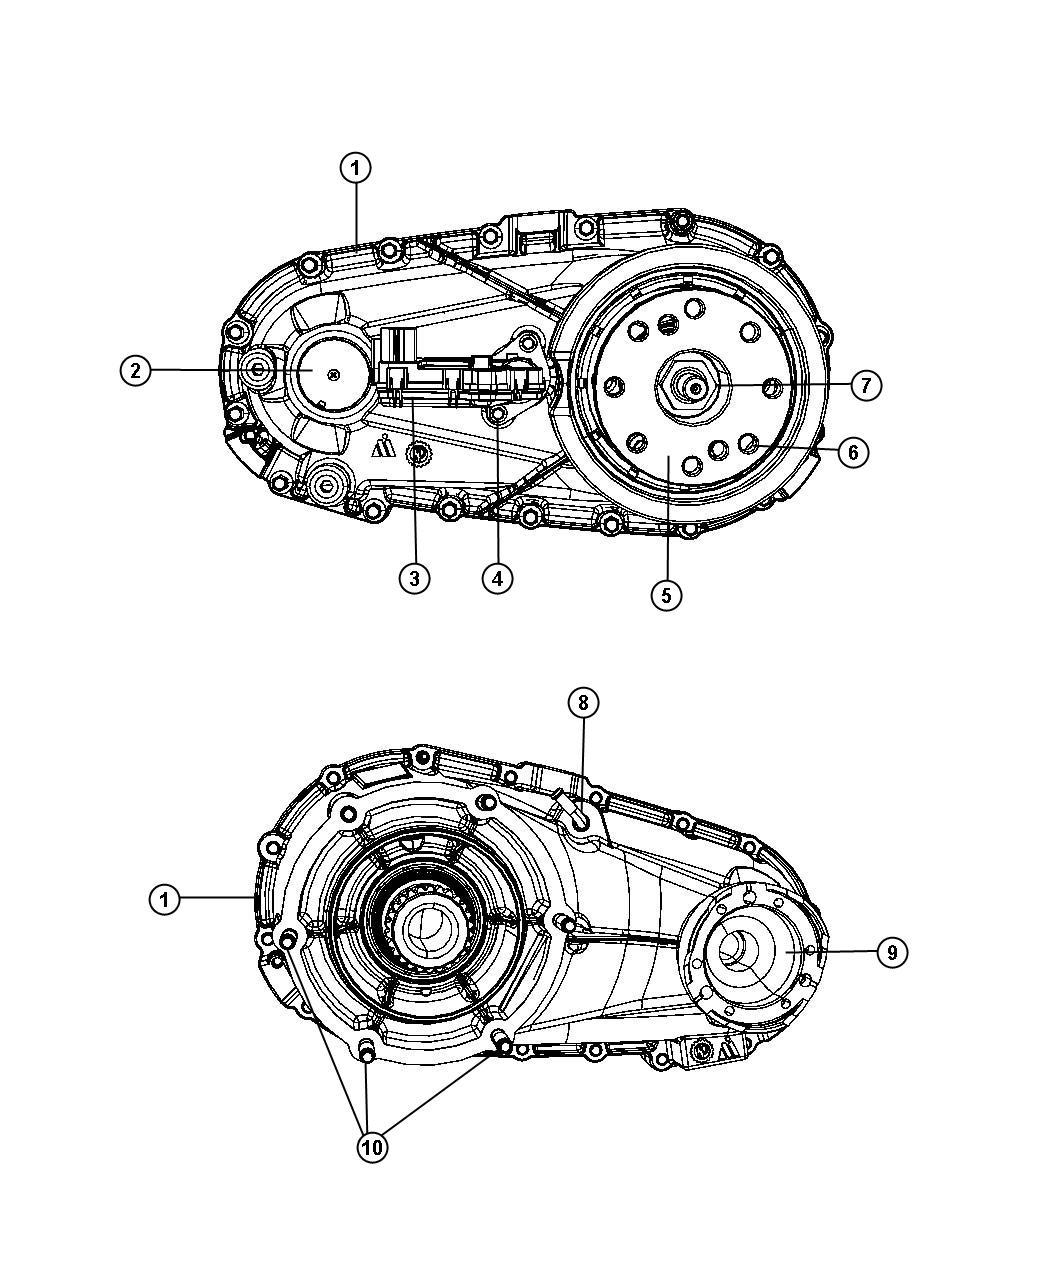 Dodge Nitro Transfer Case  Nvg143   4 0l V6 Sohc Engine   5-speed Auto W5a580